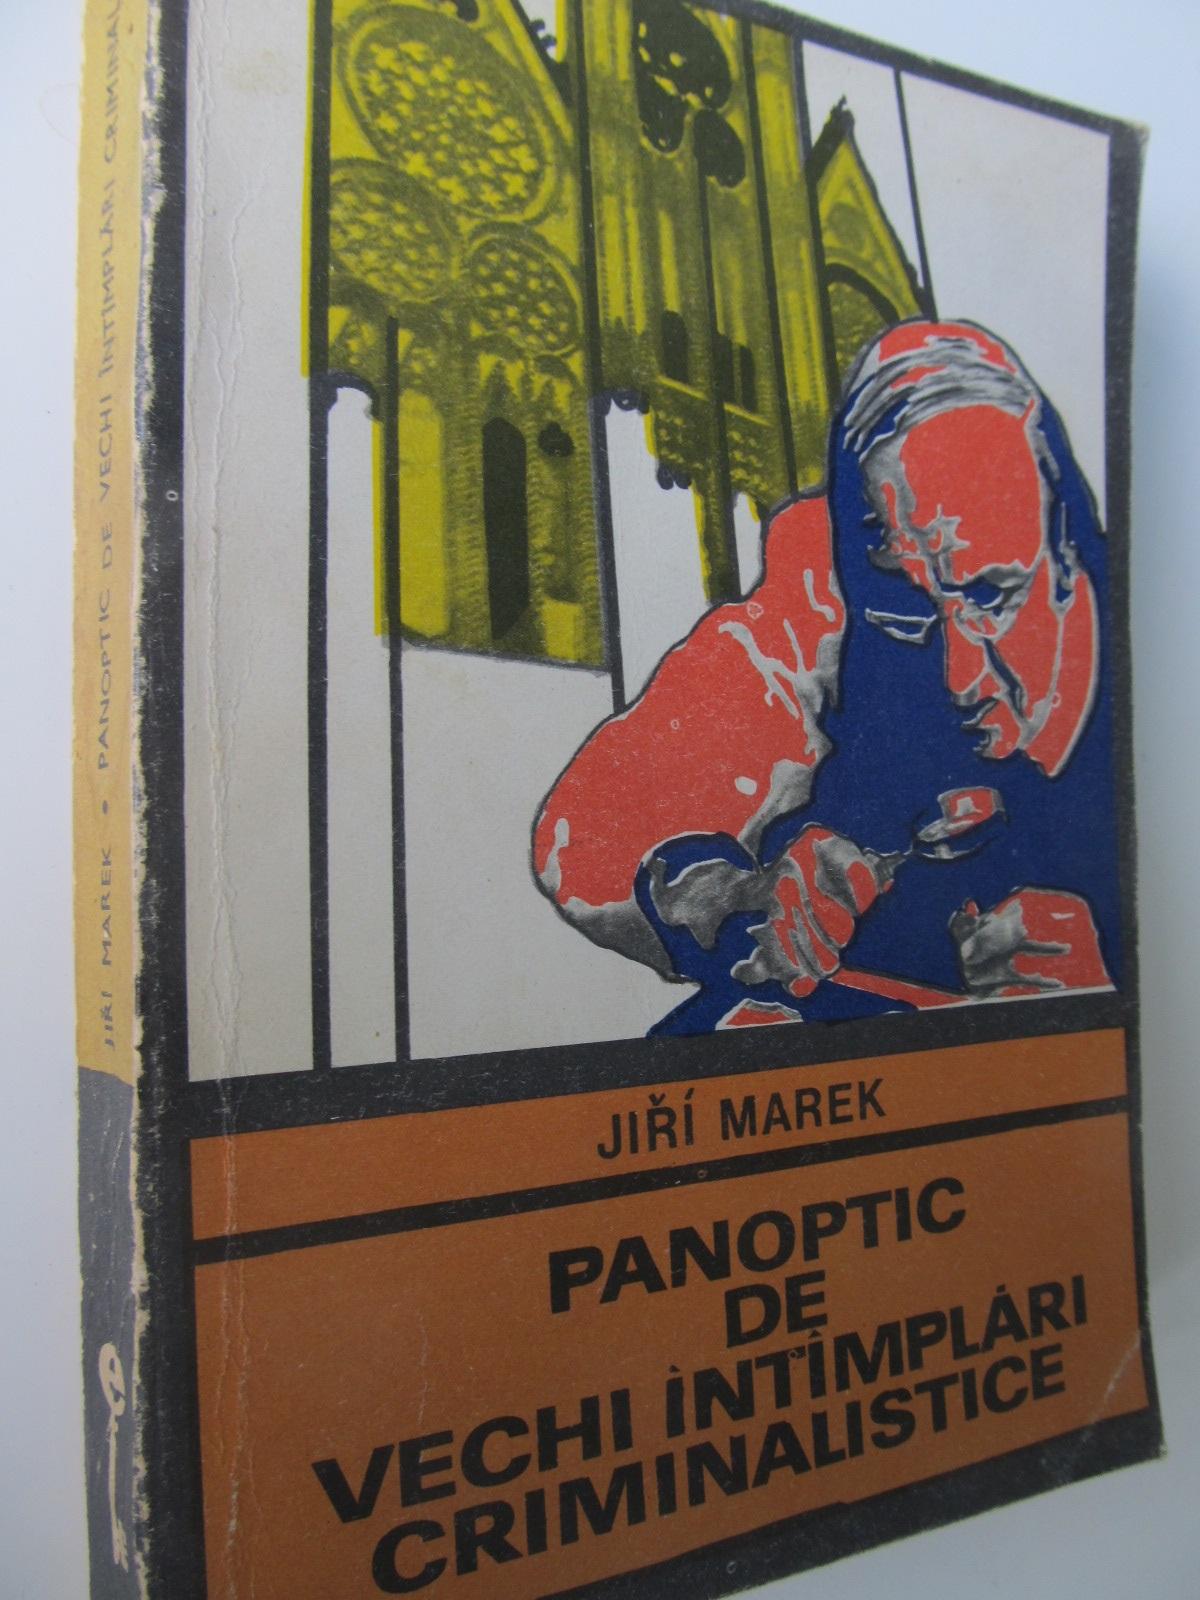 Carte Panoptic de vechi intamplari criminalistice - Jiri Marek